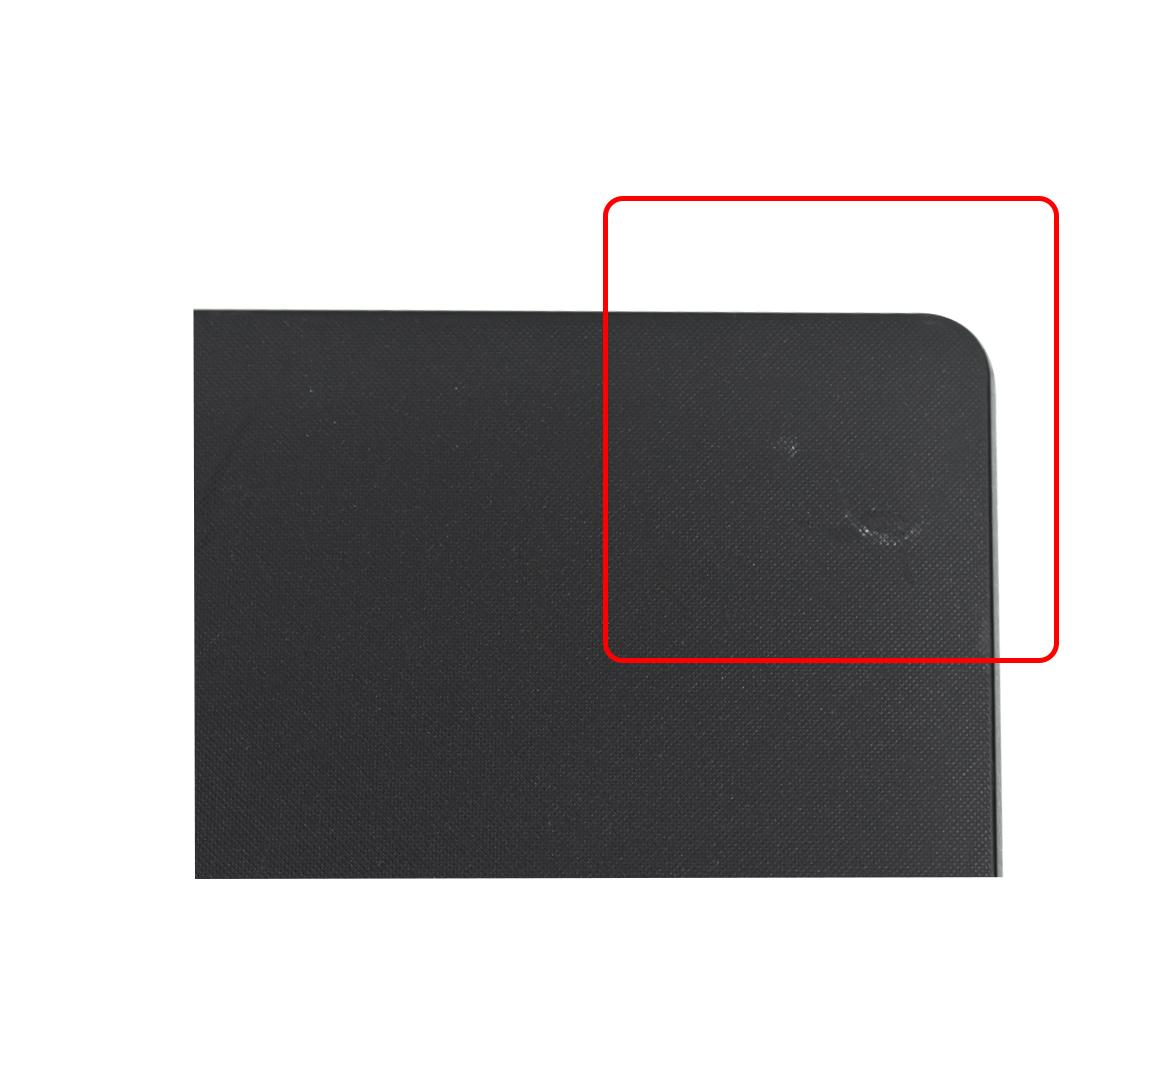 Dell Inspiron 3558 Business Laptop, Intel Core i3-5015U @ 2.10GHZ CPU, 8GB DDR3L SODIMM RAM, 256GB SSD 2.5 , 15 inch Display, Windows 10 Pro (Refurbished)